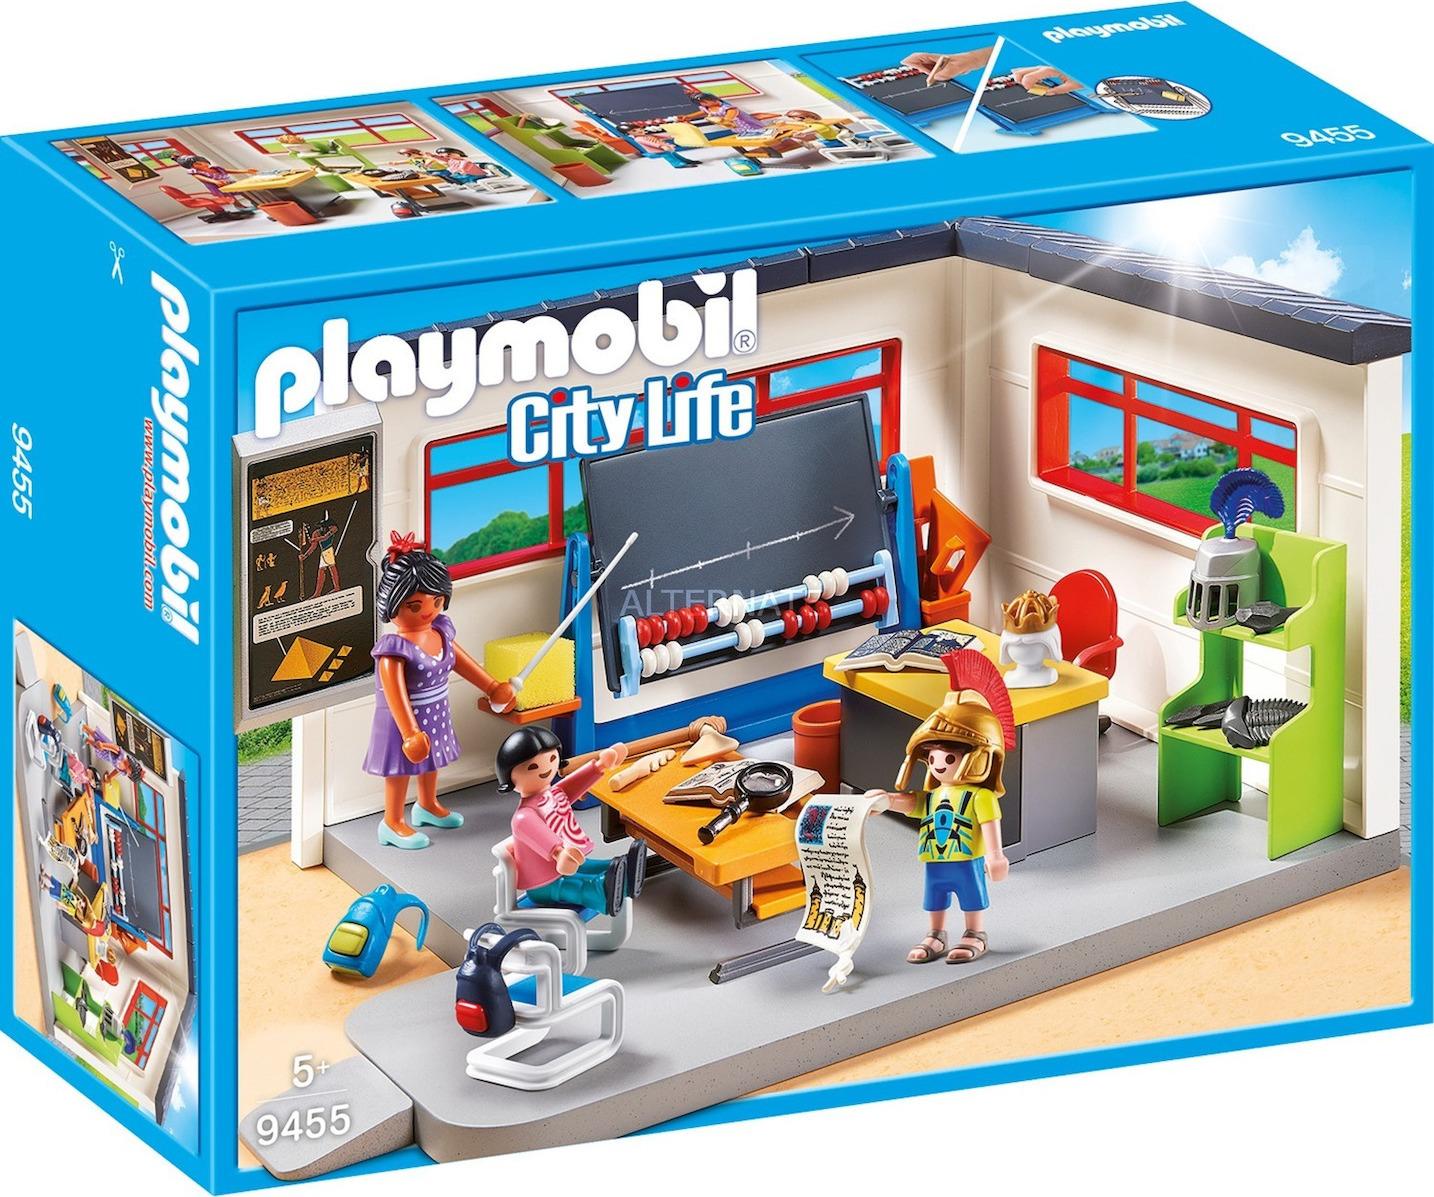 Playmobil City Life: Classroom History Lessons 9455